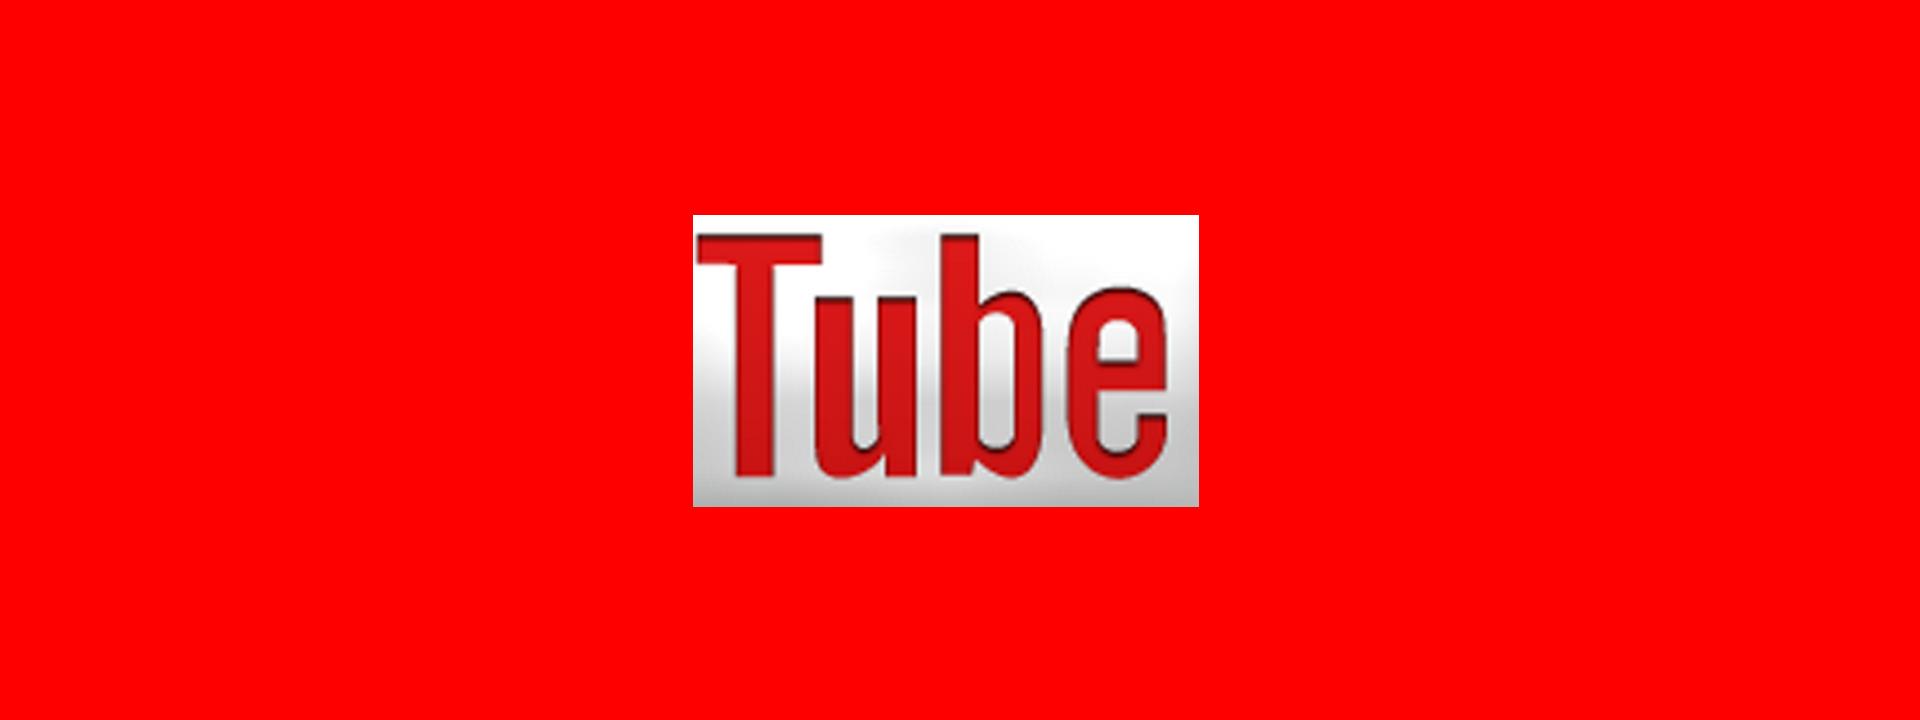 Buy kids movies on youtube